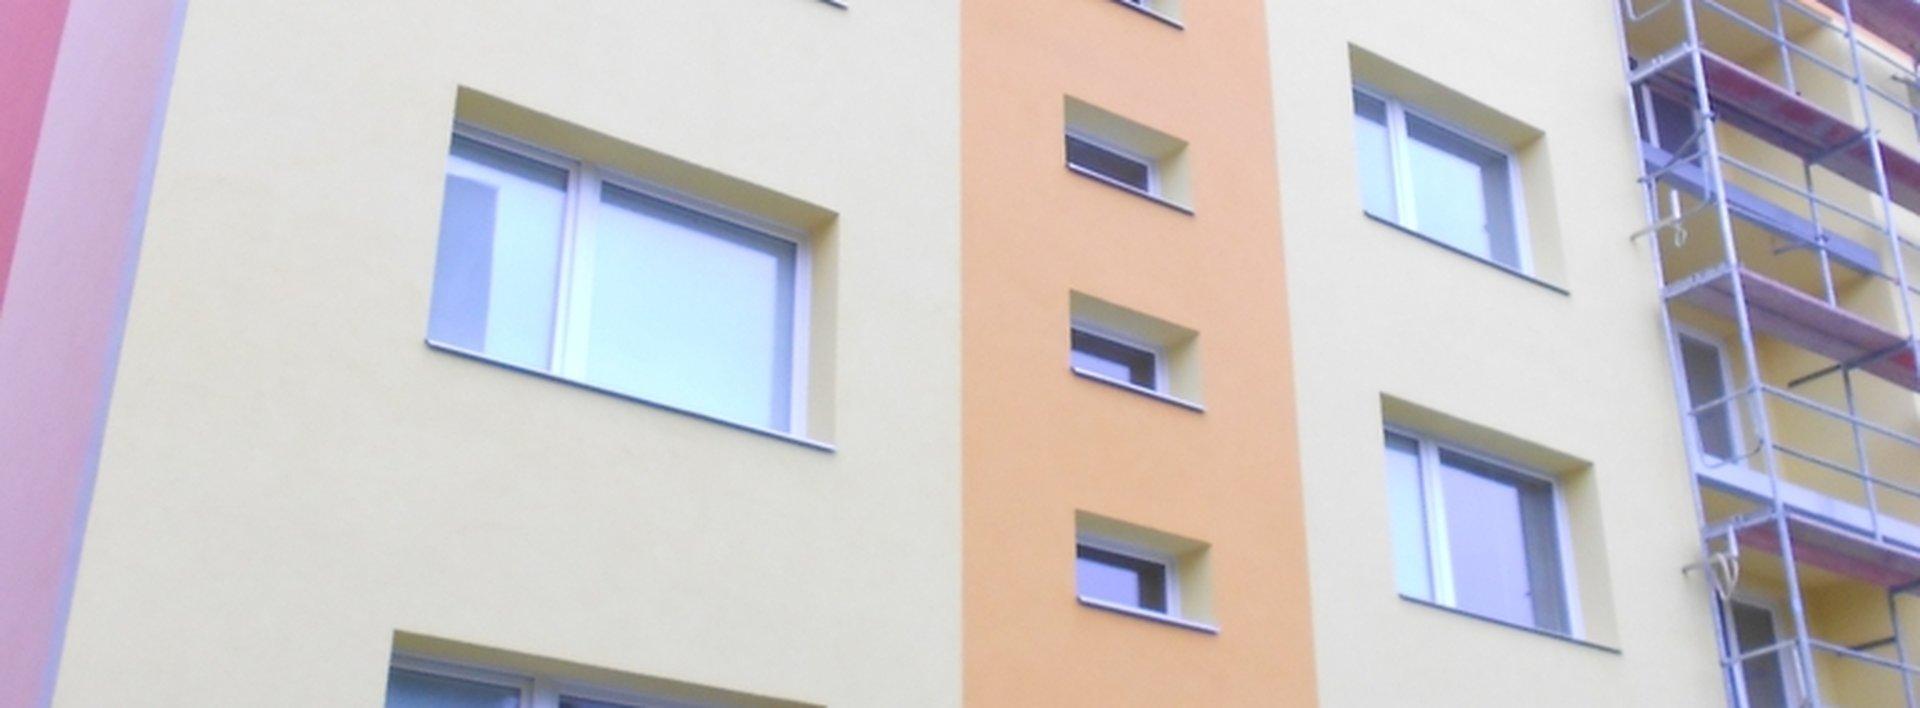 Pronájem bytu 2+kk, Starý Harcov, Ev.č.: N46480